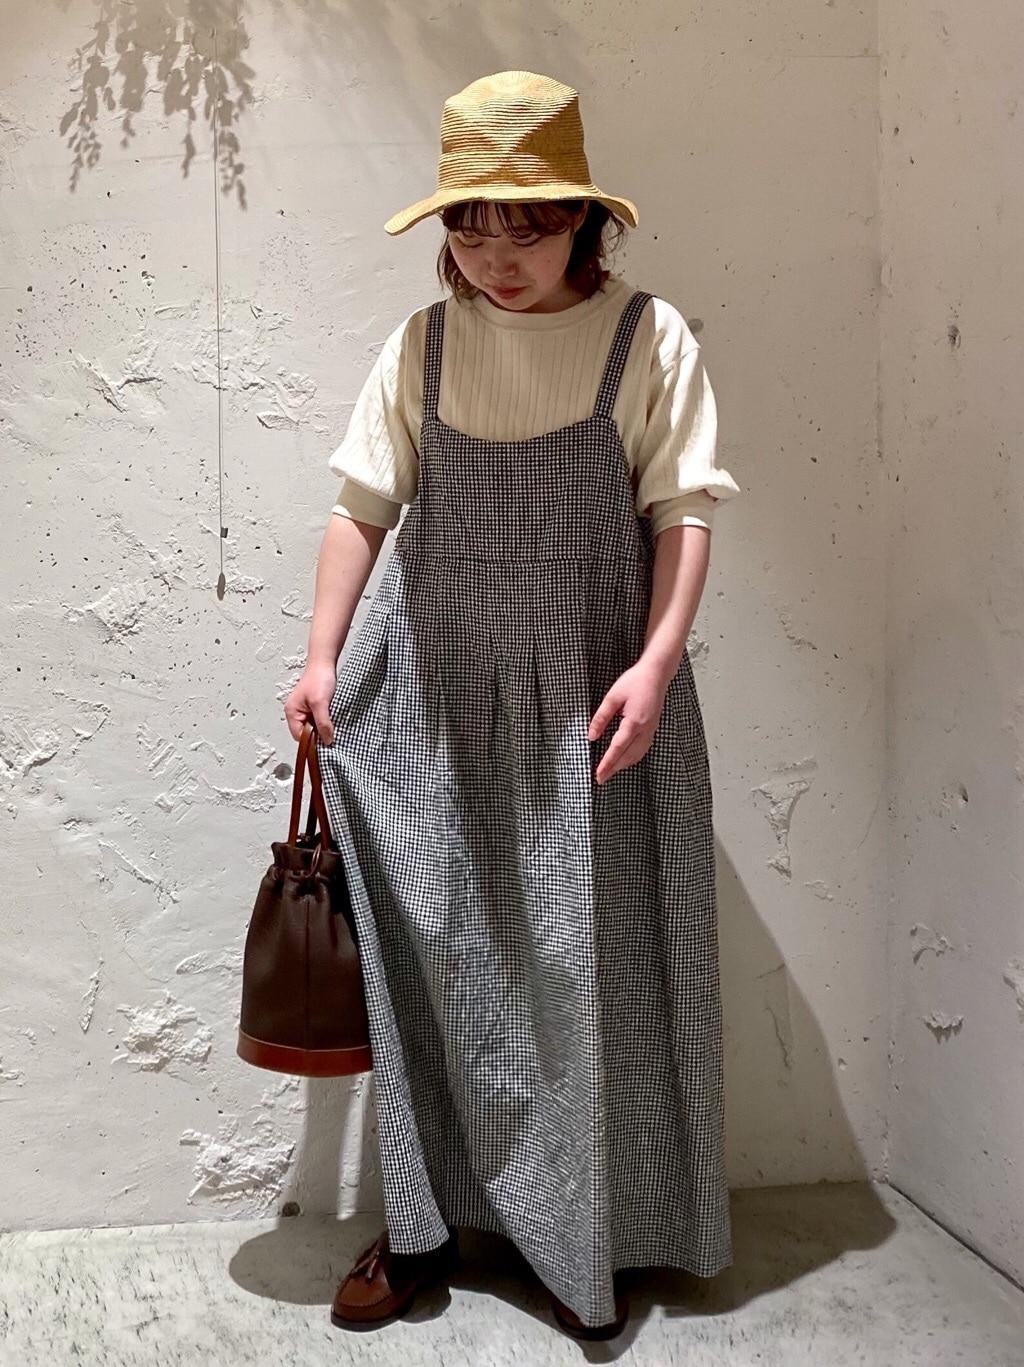 chambre de charme 京都路面 身長:150cm 2020.04.02